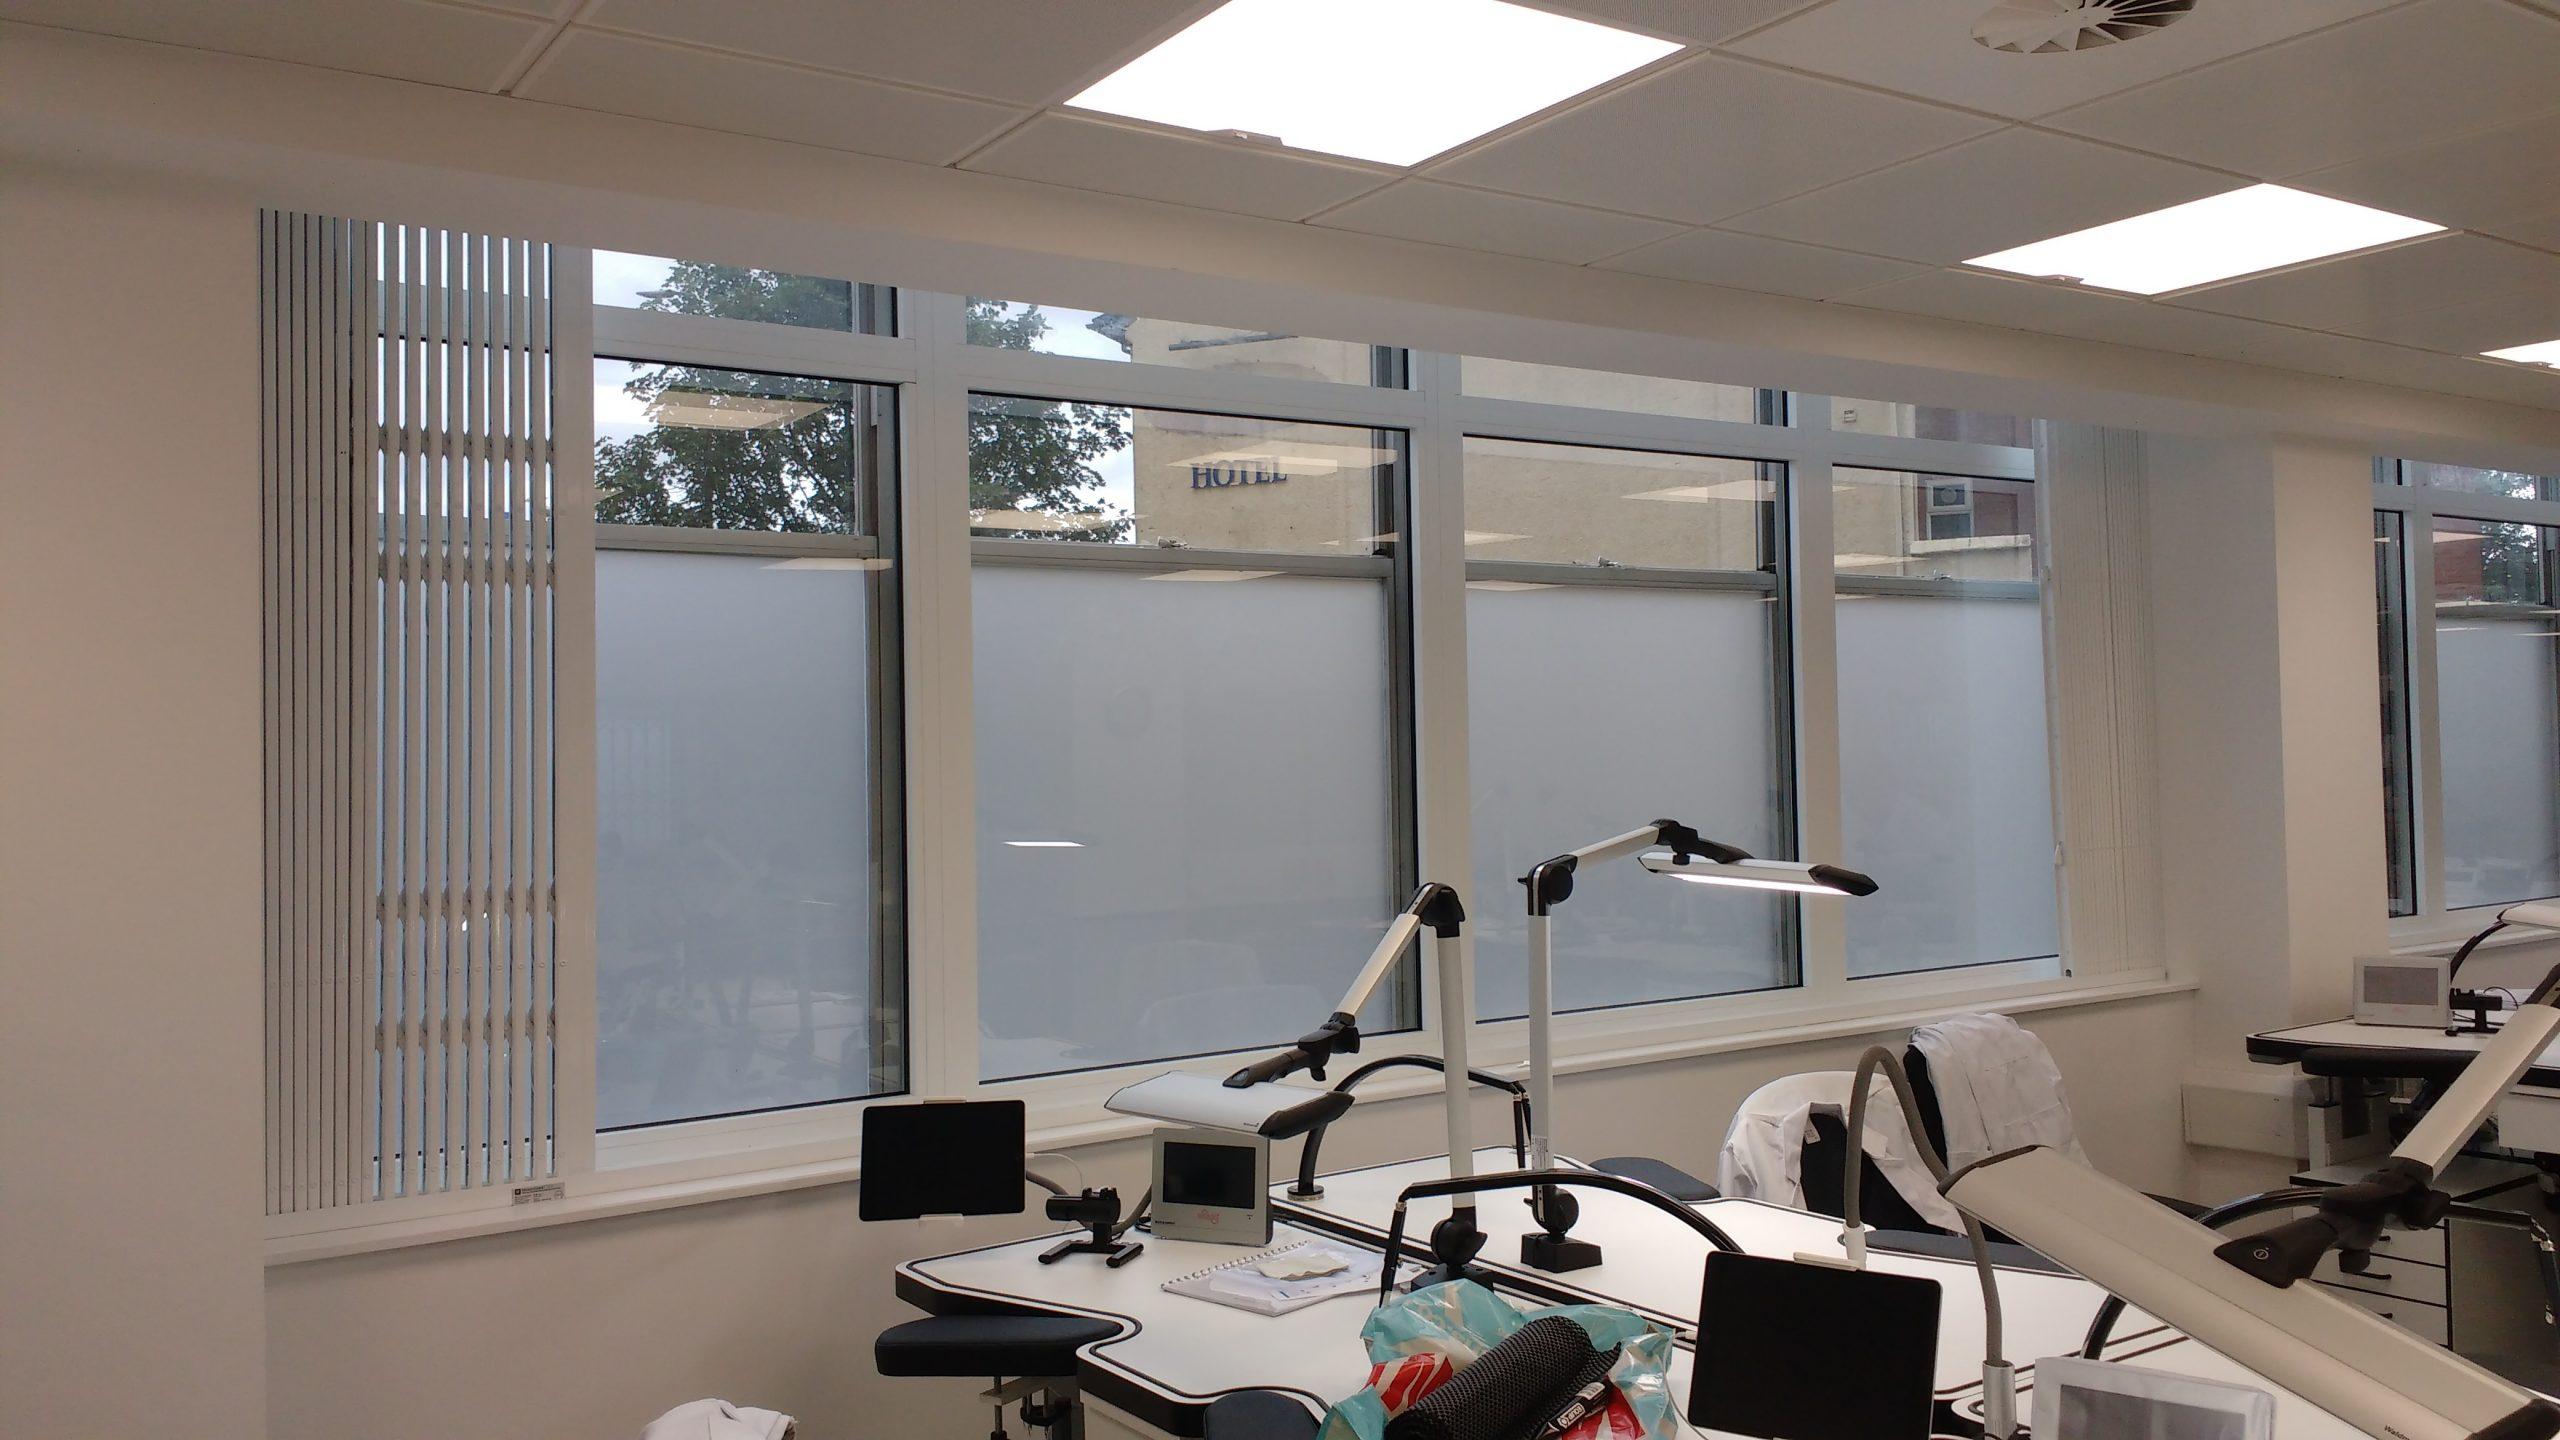 retractable window grille installation